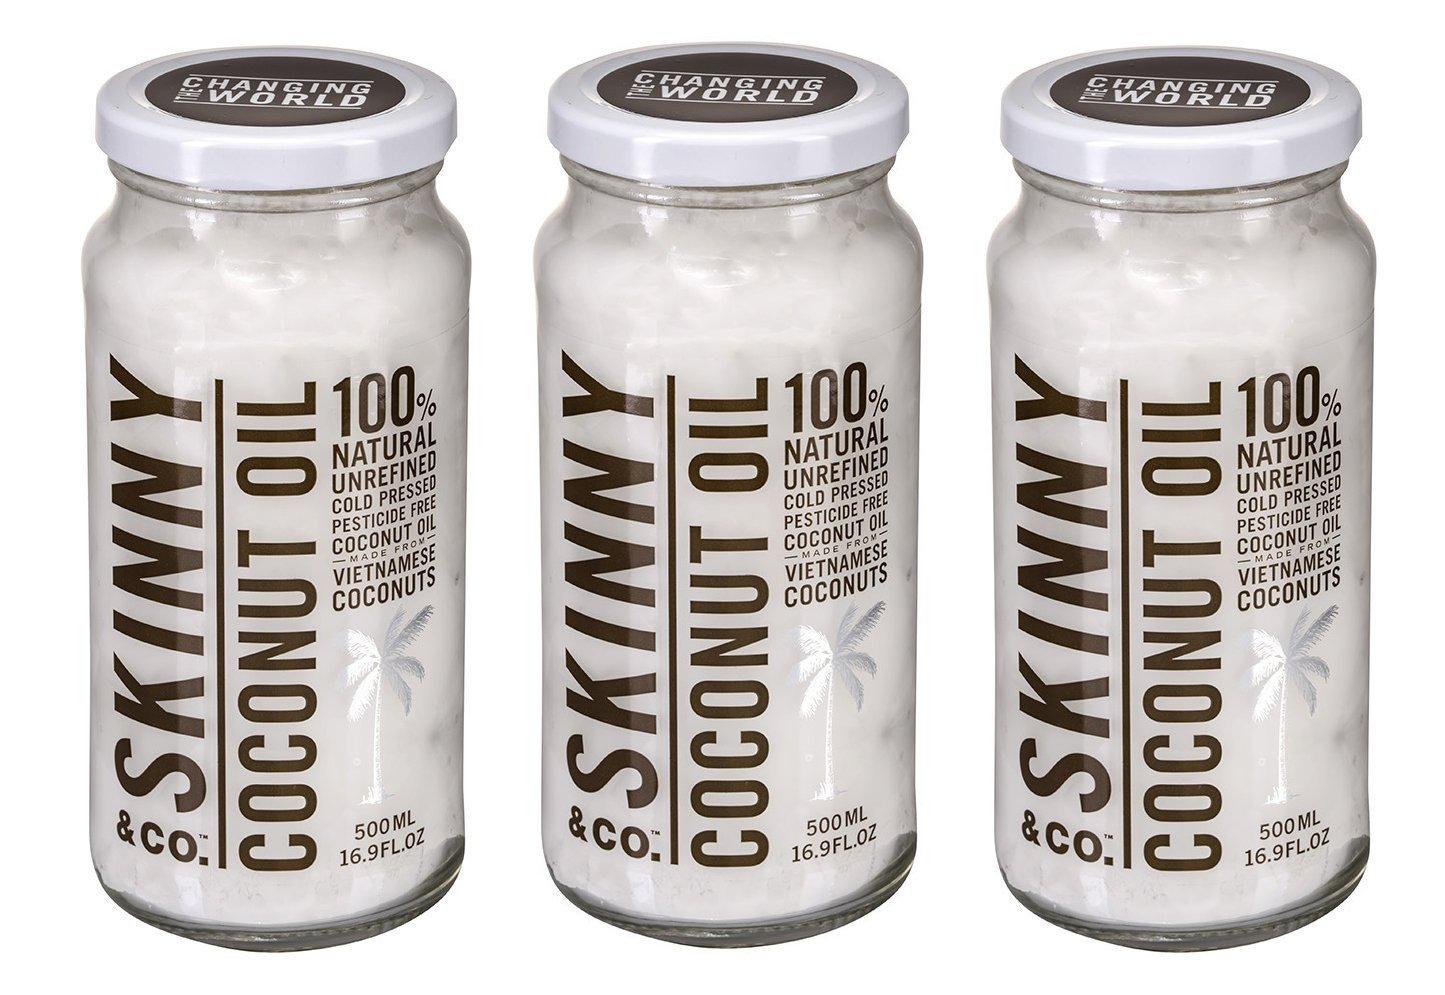 3 Pack - Skinny & Co. Coconut Oil Raw Alkaline 16.9 Fl Oz Jar